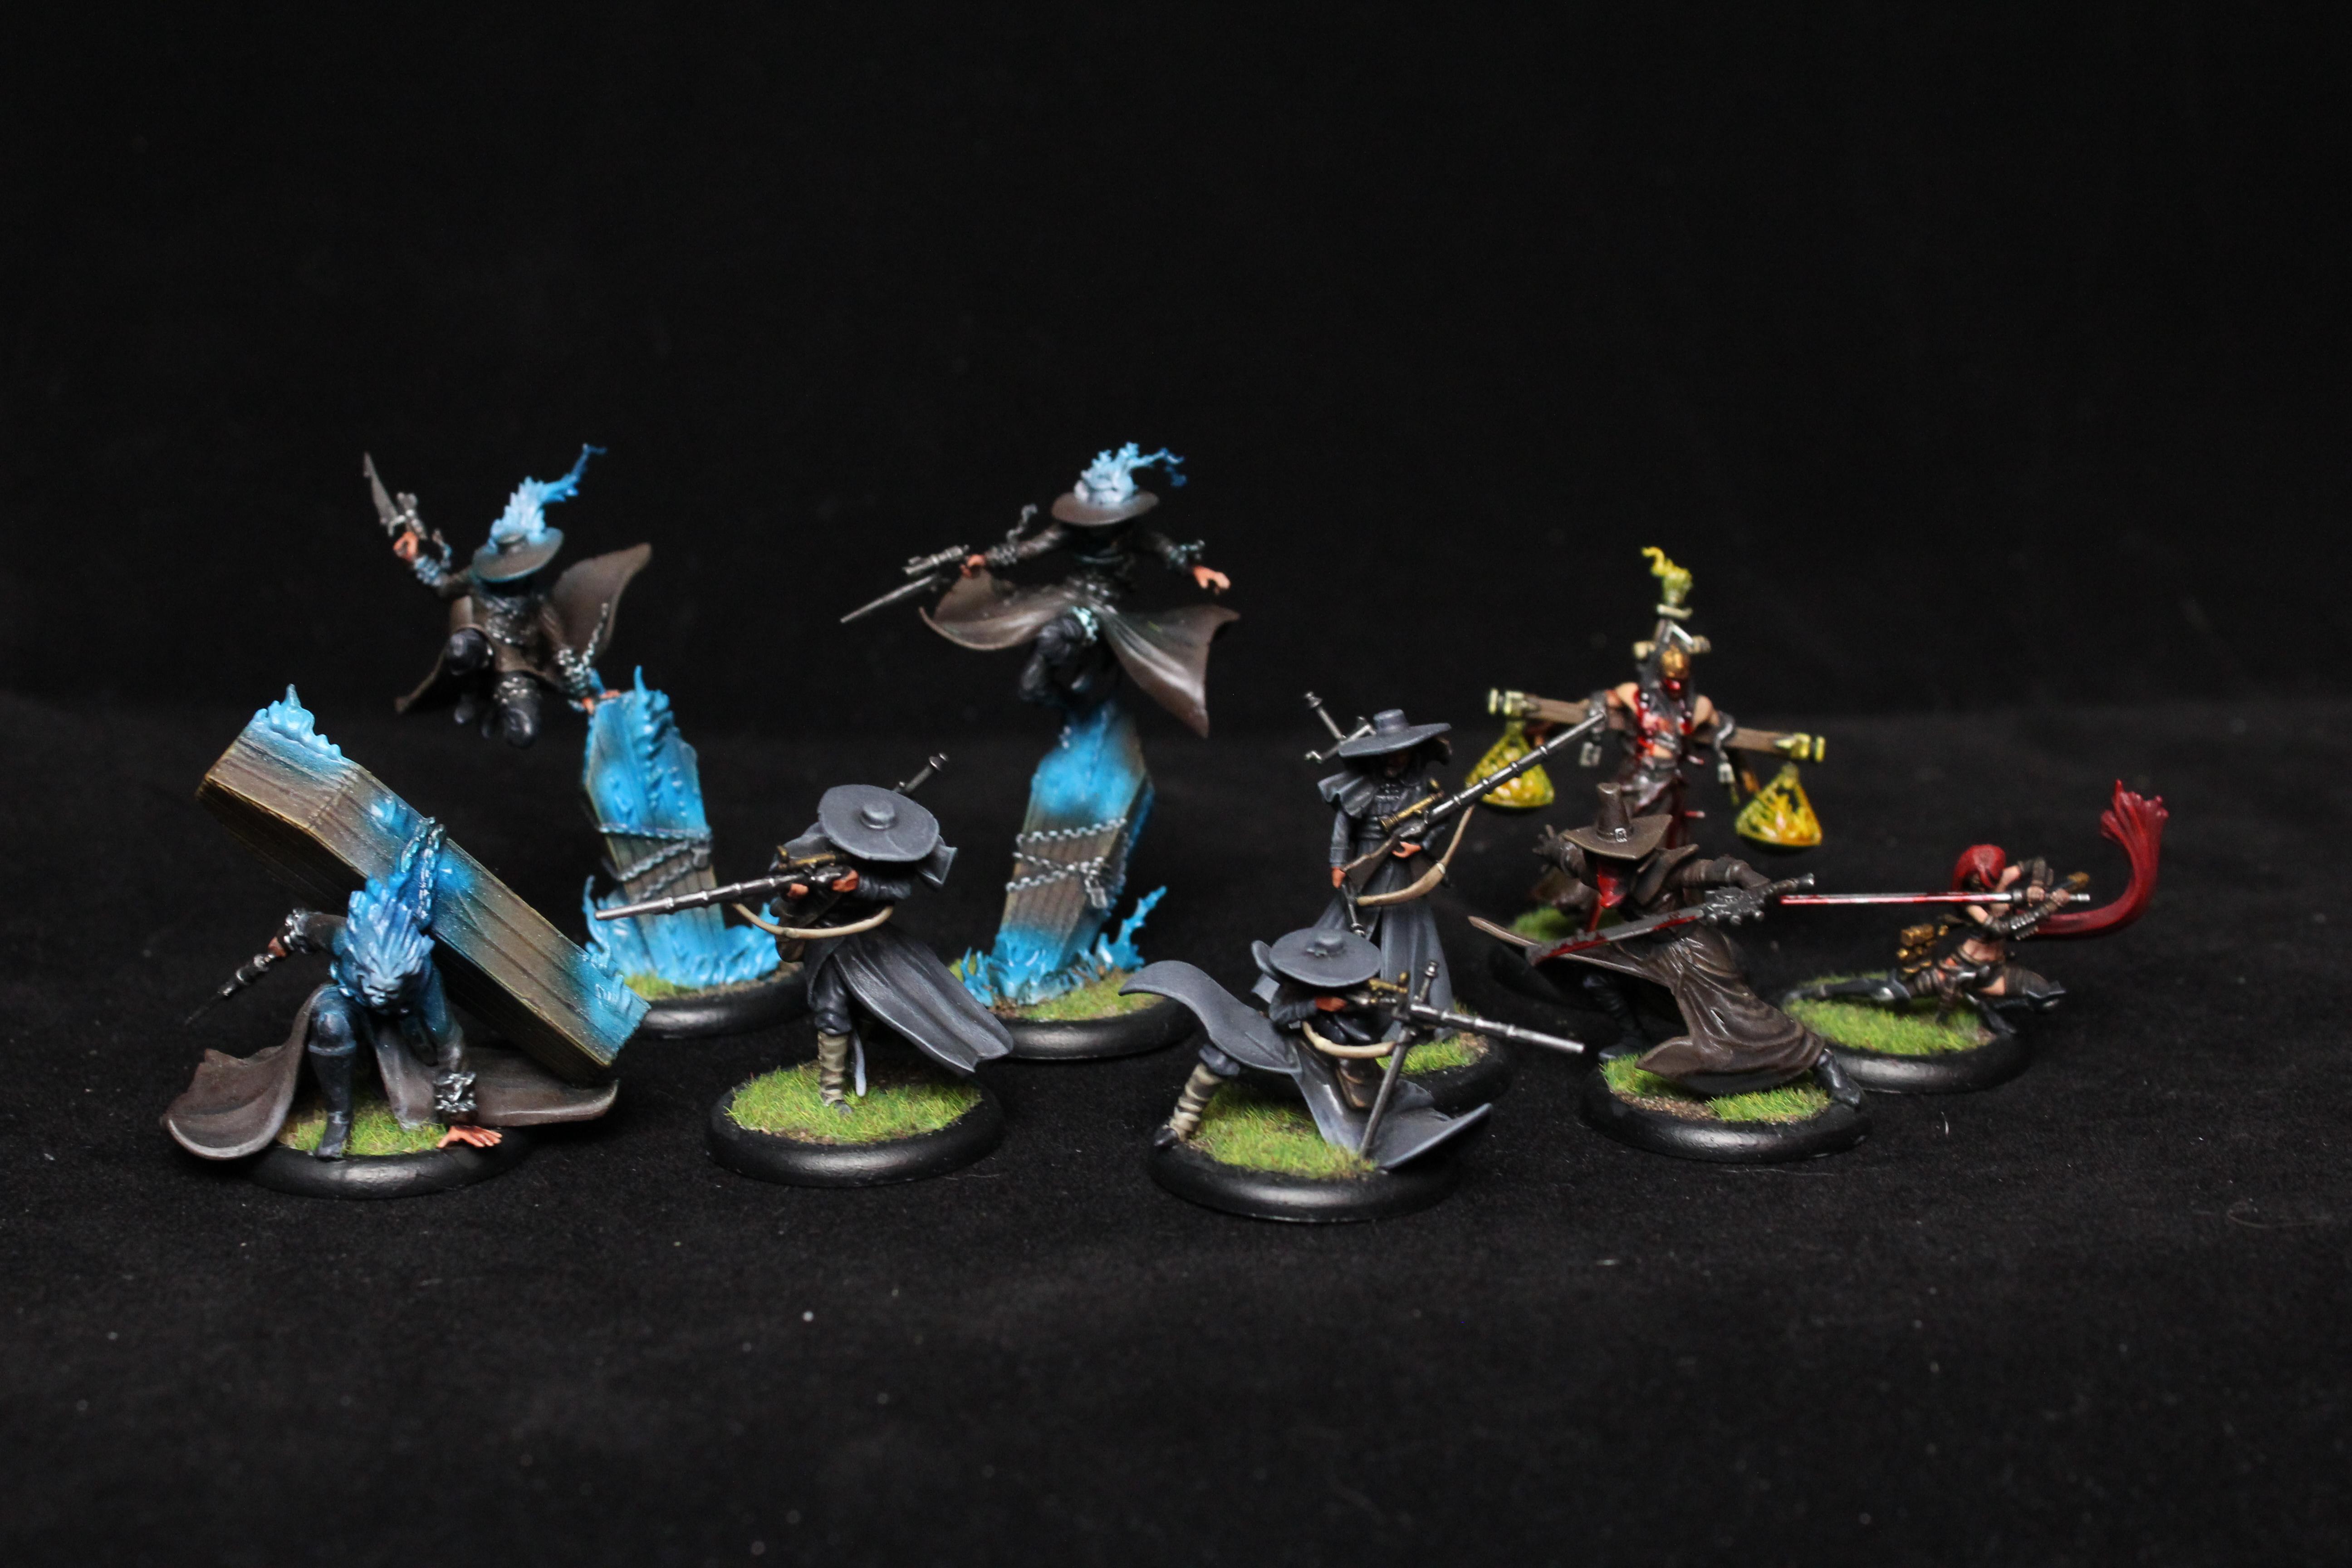 Death Marthal, Guild, Lady Justice, Malifaux, Riflemen